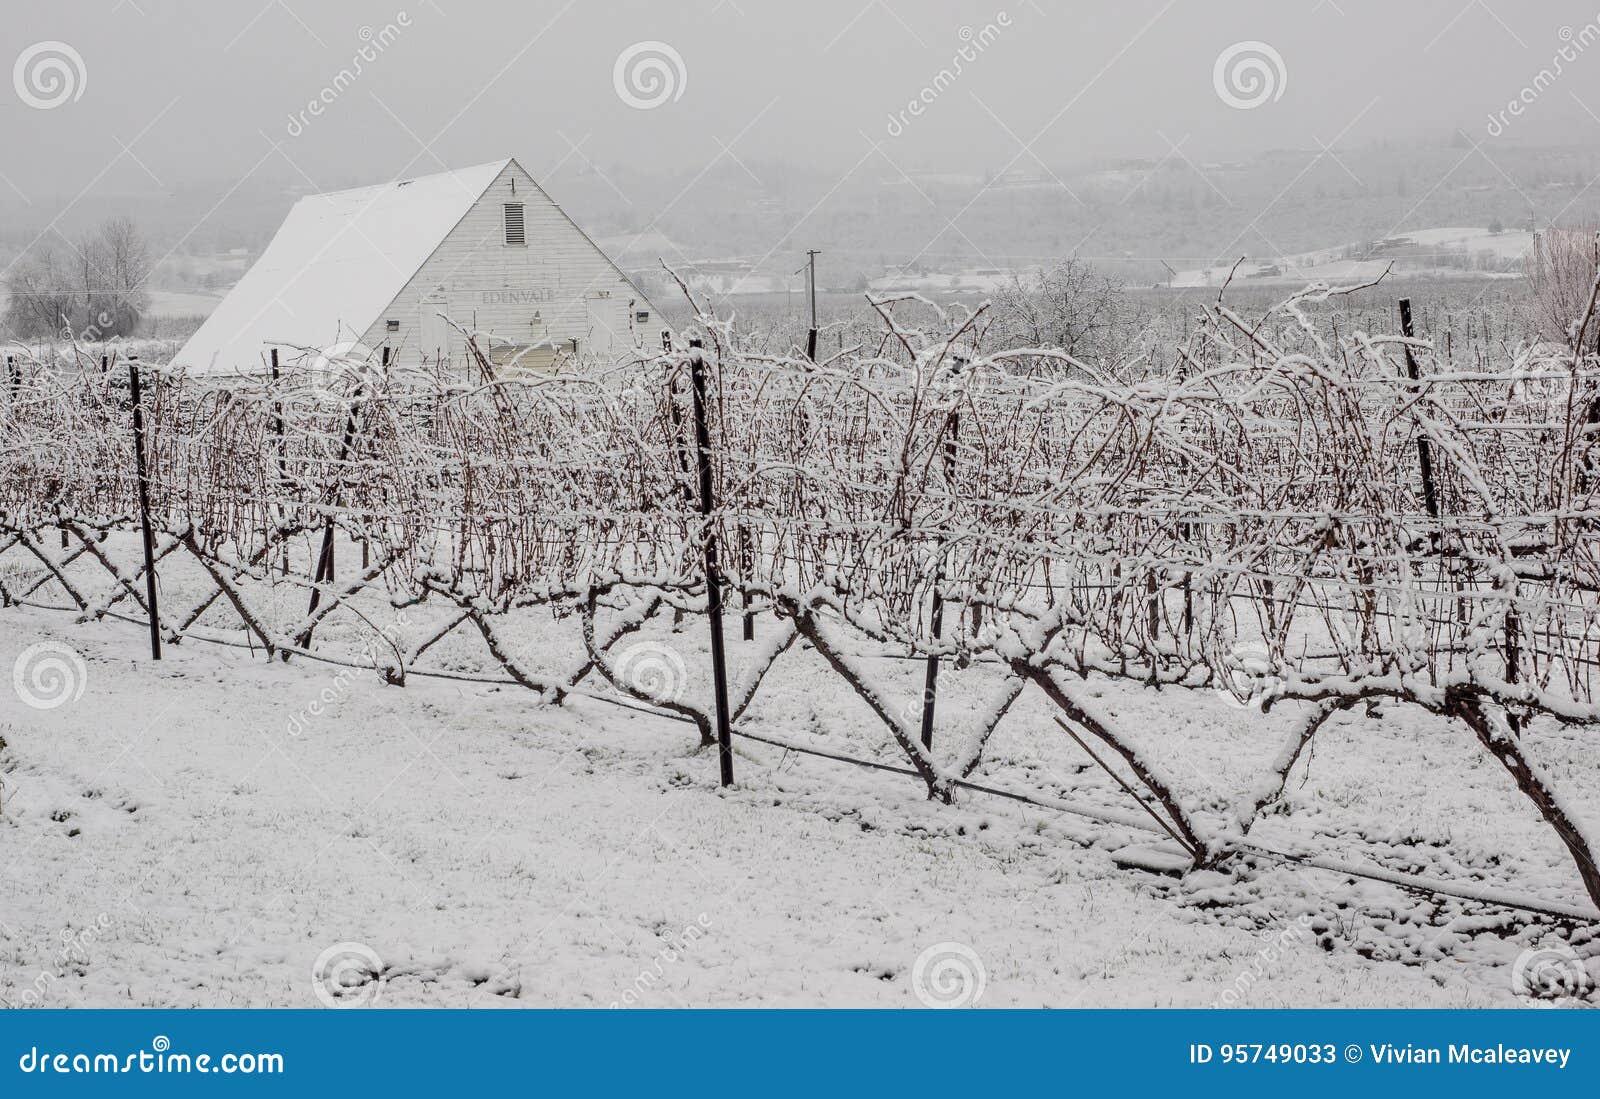 Vineyard rural area in winter